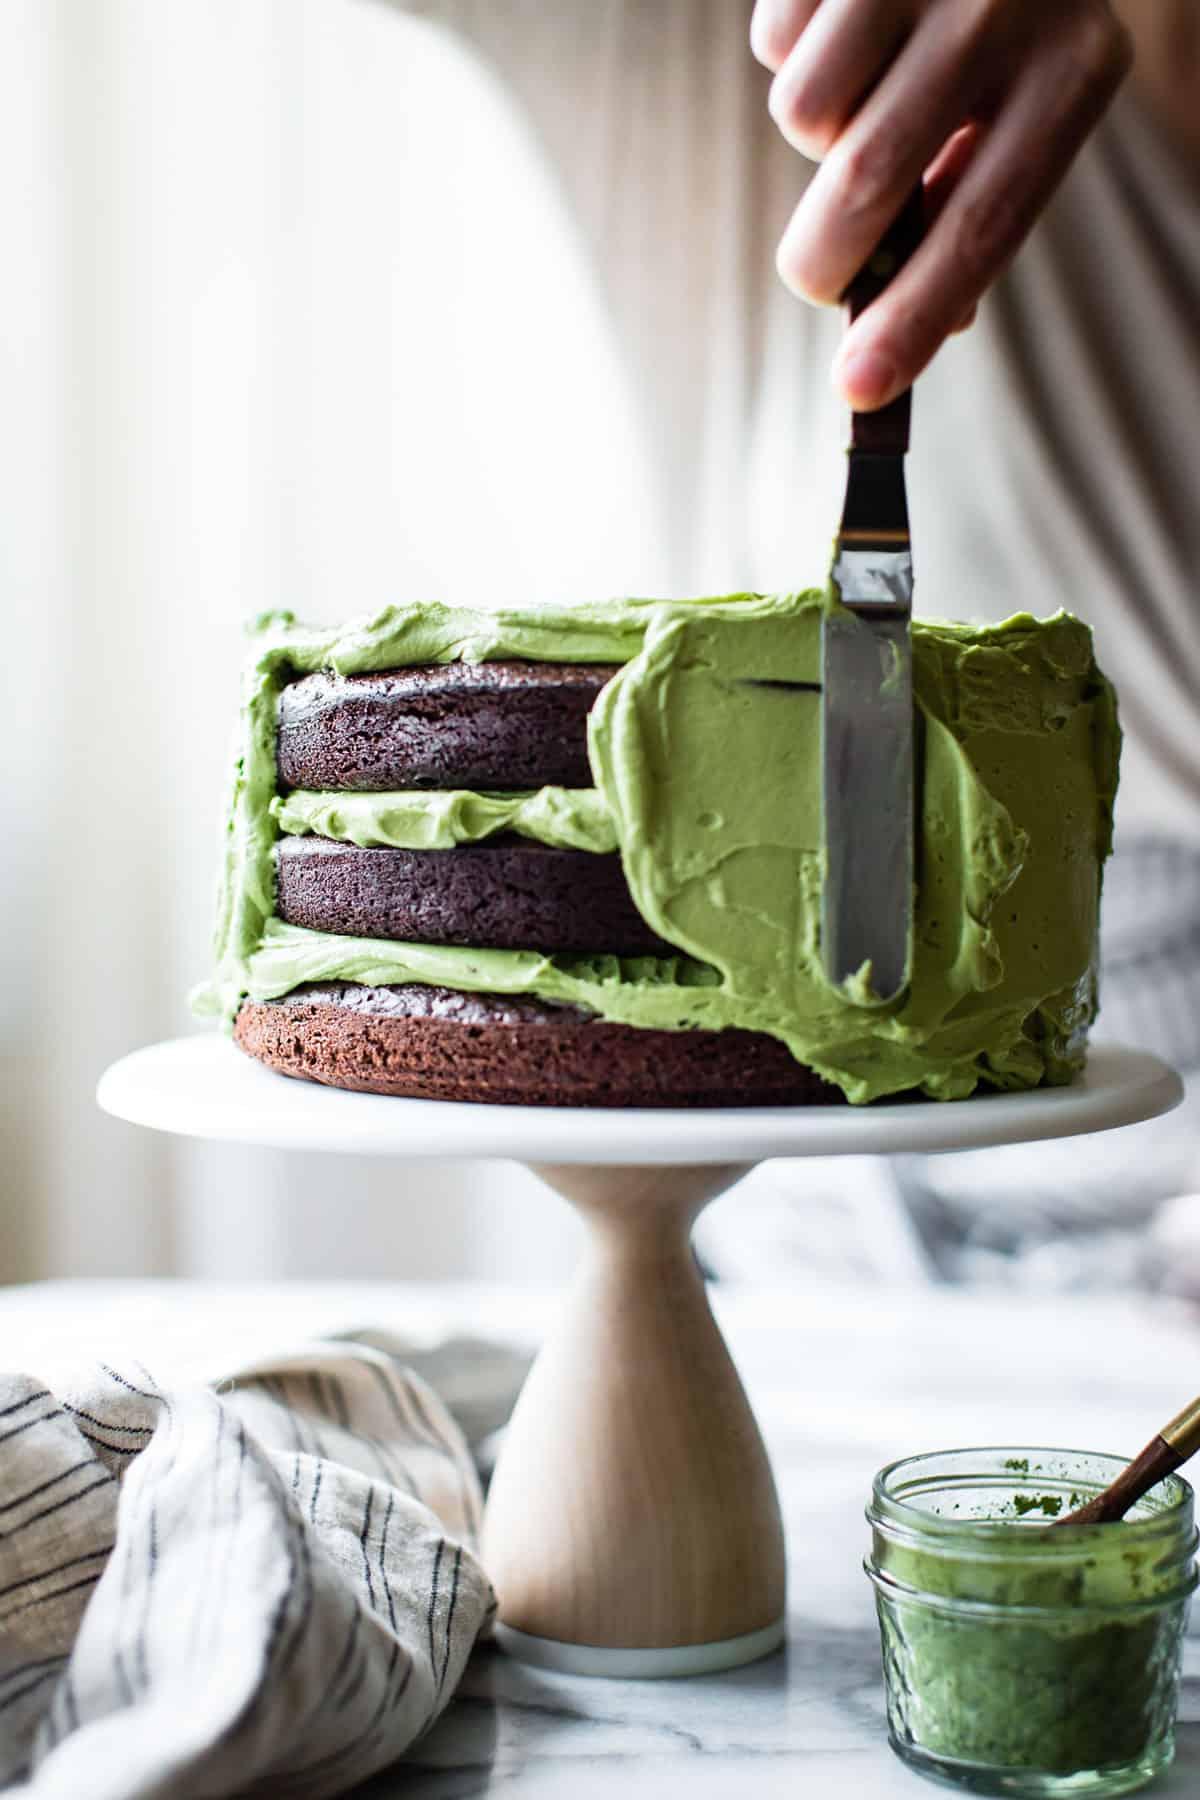 gluten-free cake recipe: chocolate zucchini cake